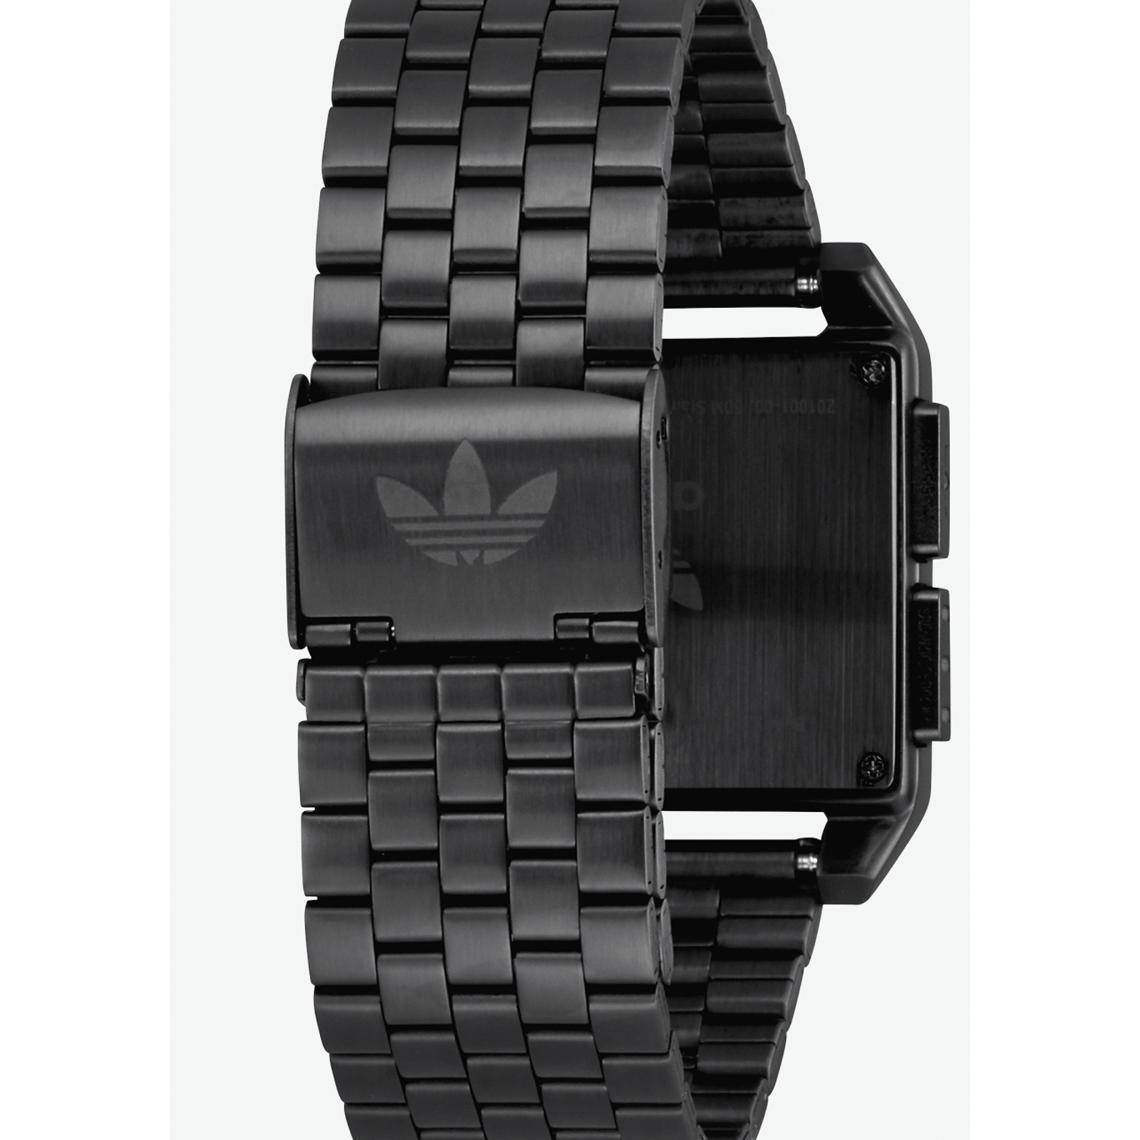 00 Noir Z01 Adidas 001 Montre Acier Originals J31Tl5cuKF